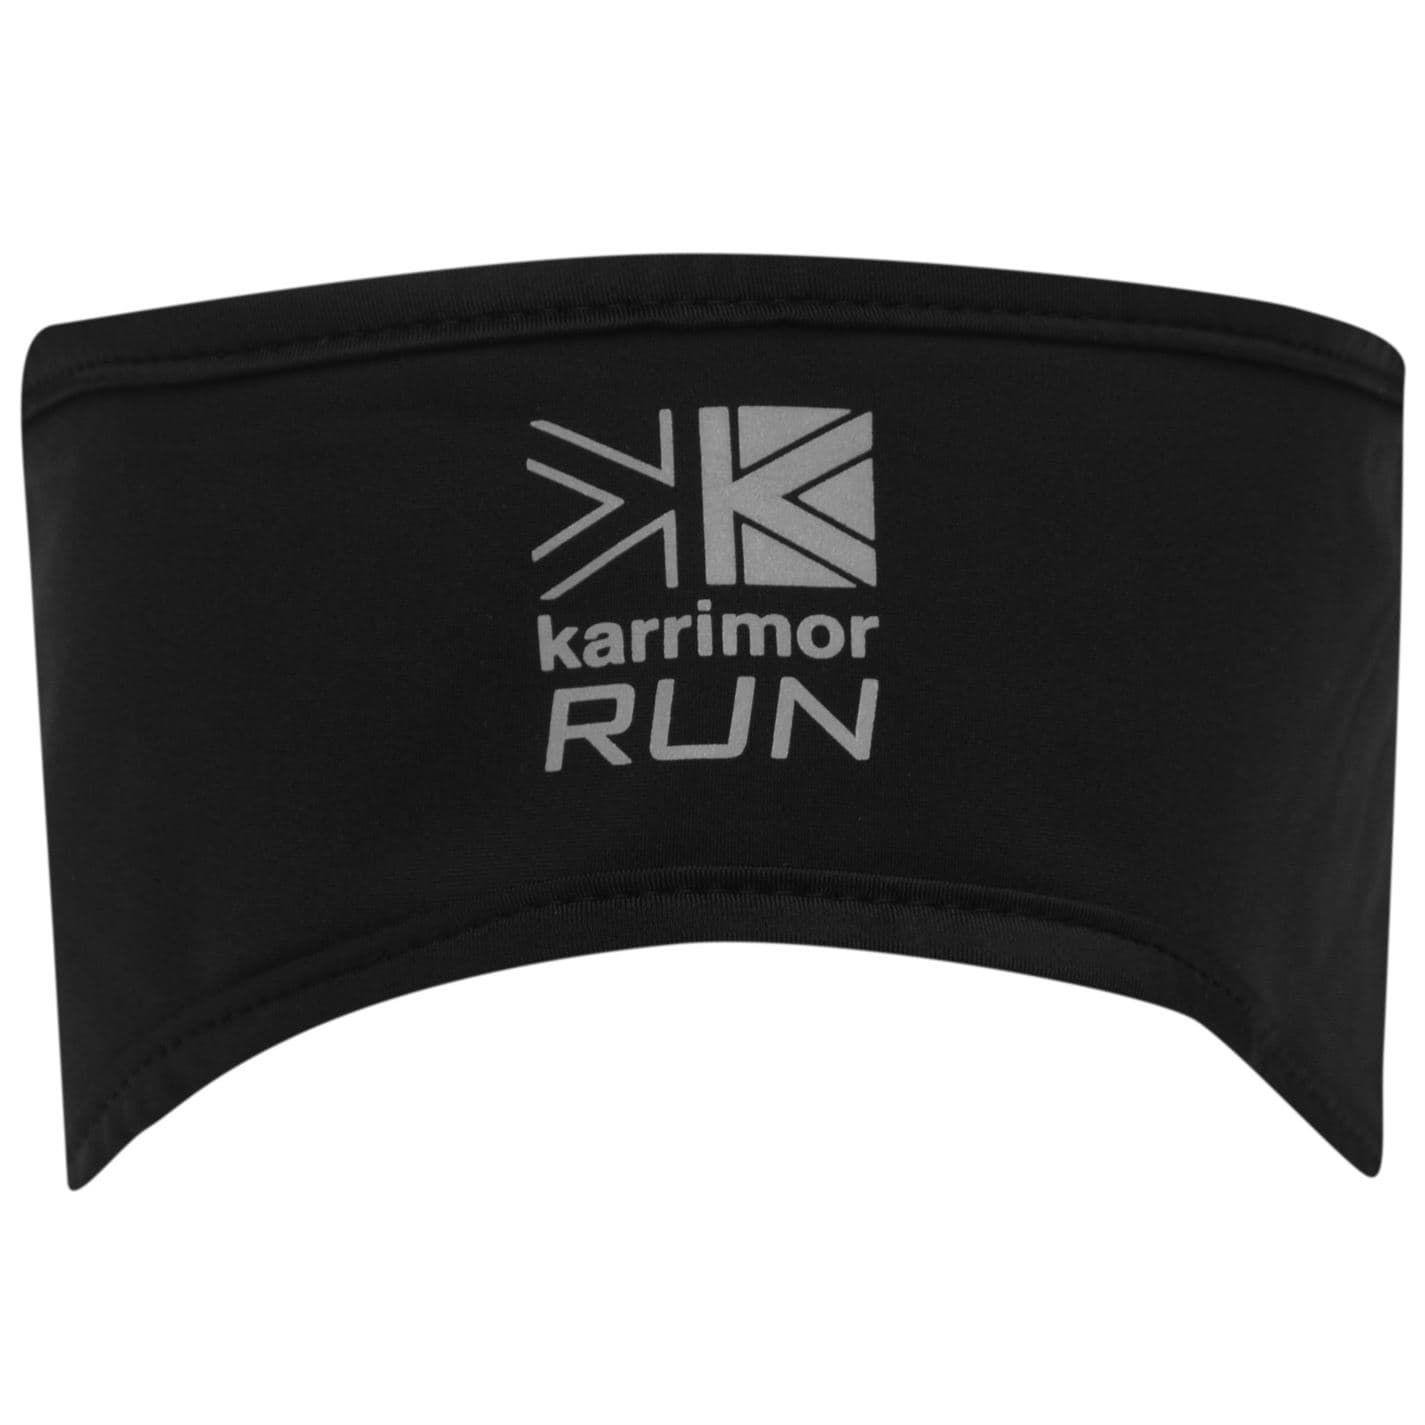 Karrimor X Run La S Headband 3